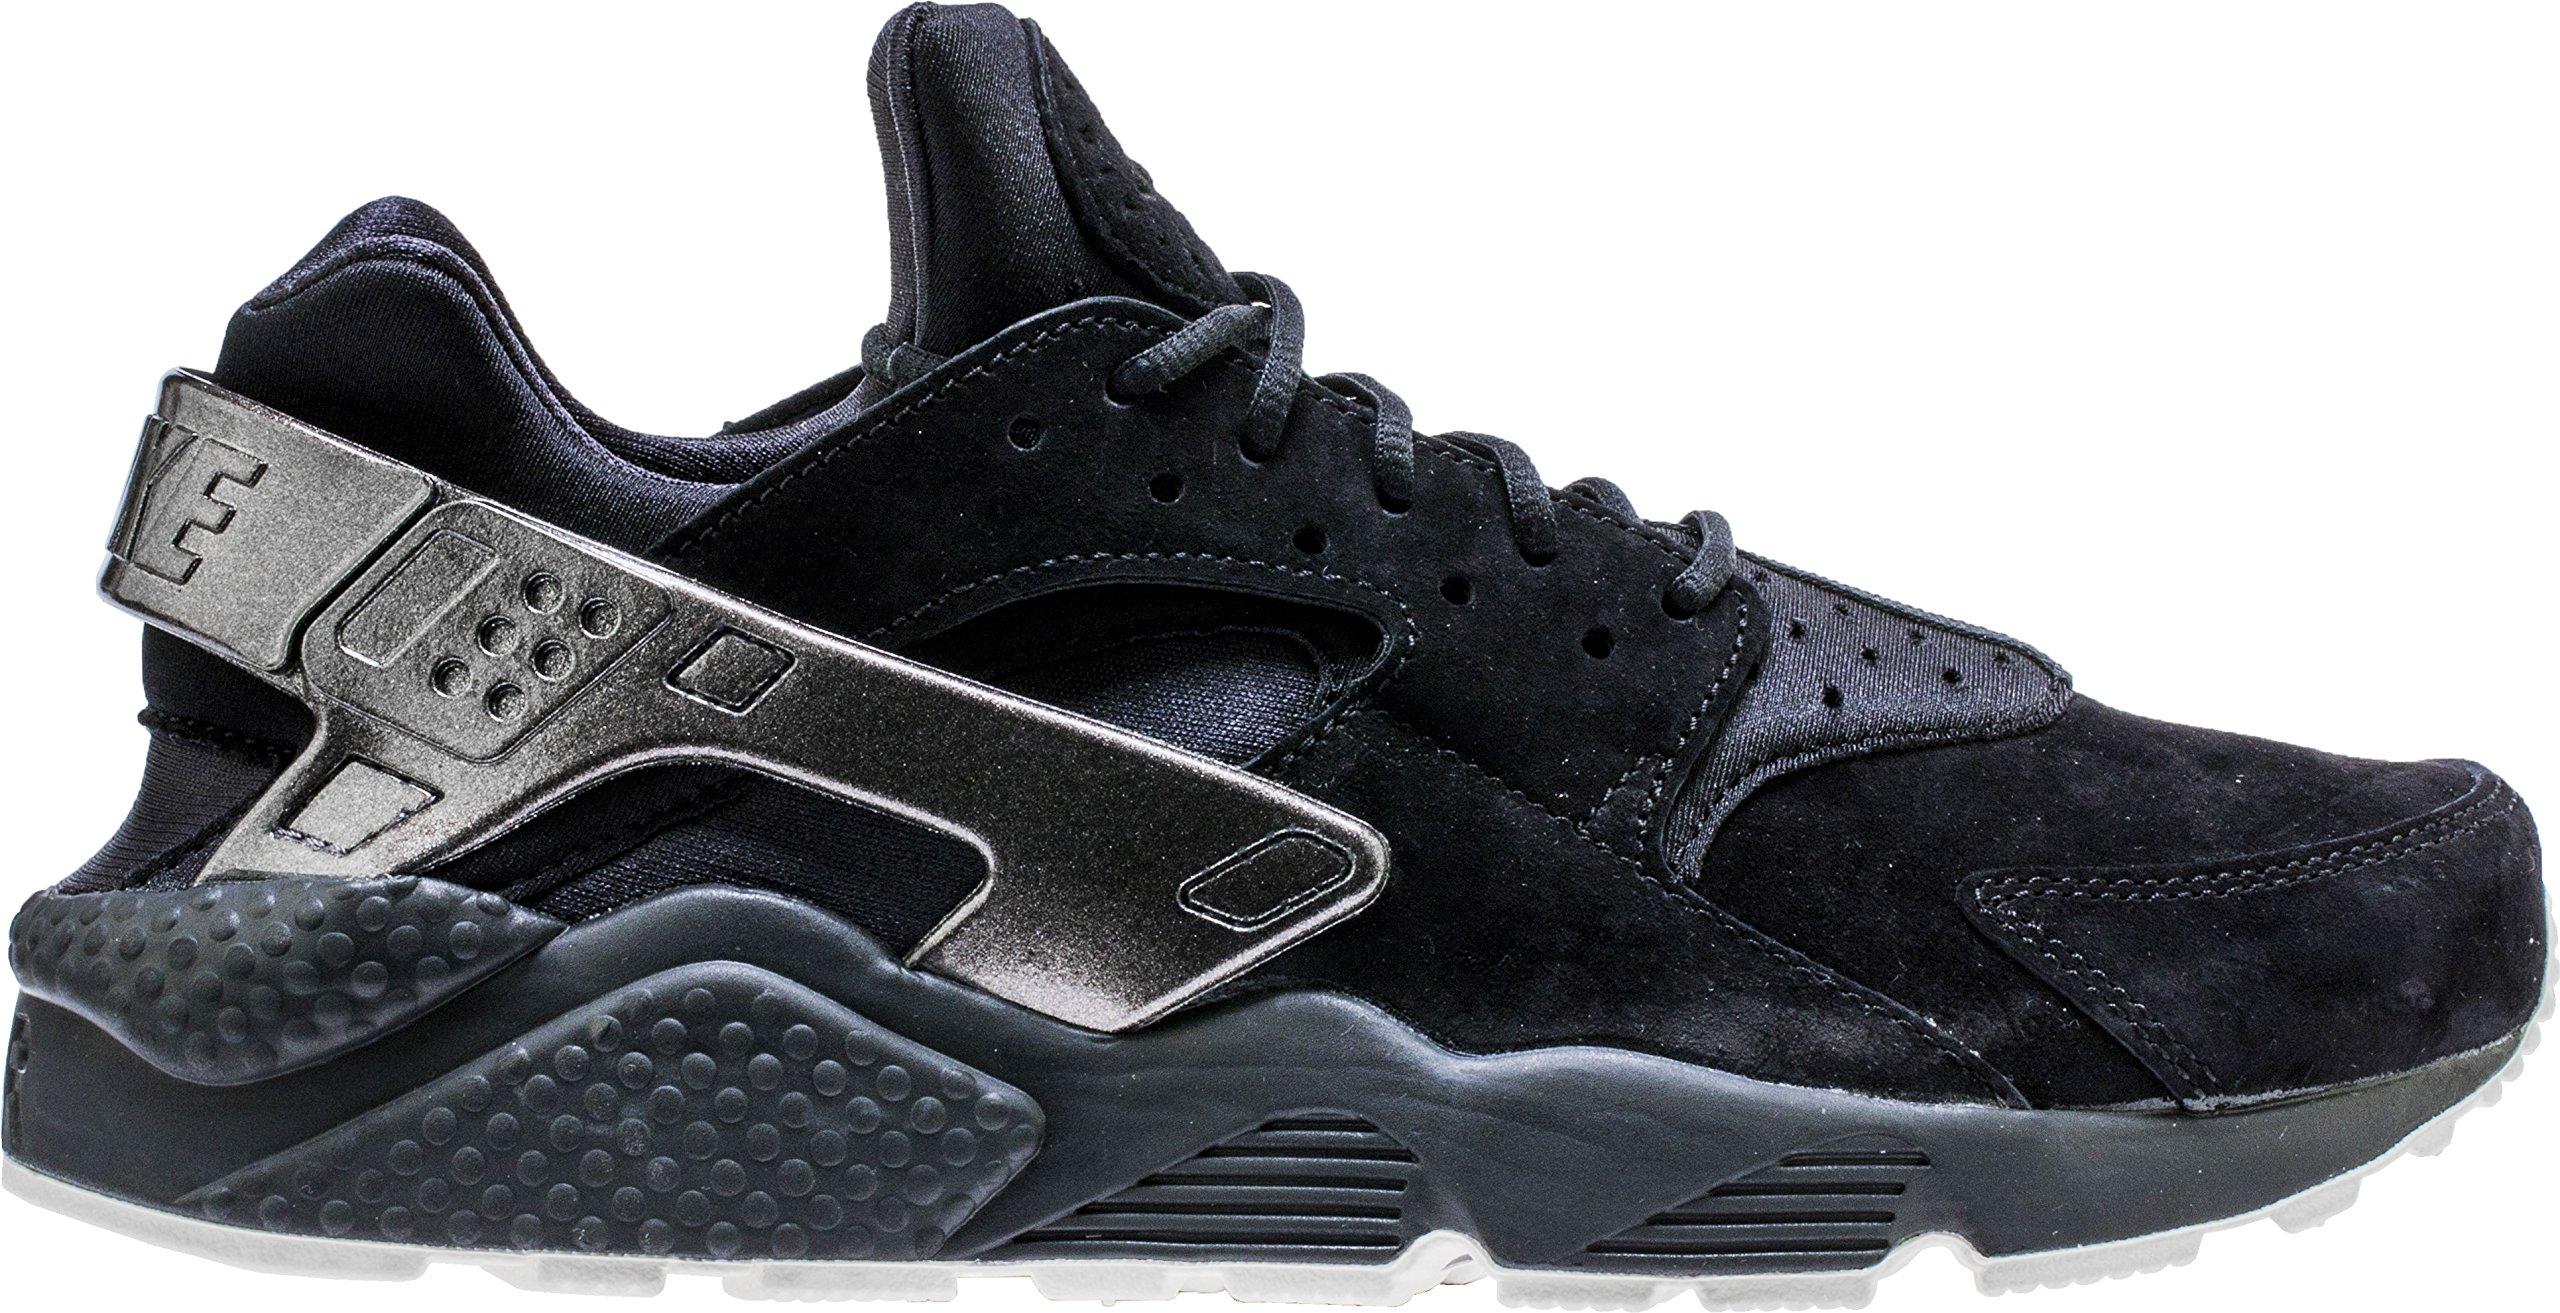 258a346df0f6b Nike Men's Air Huarache Run PRM Black/Black/Sail Running Shoe 11 Men US